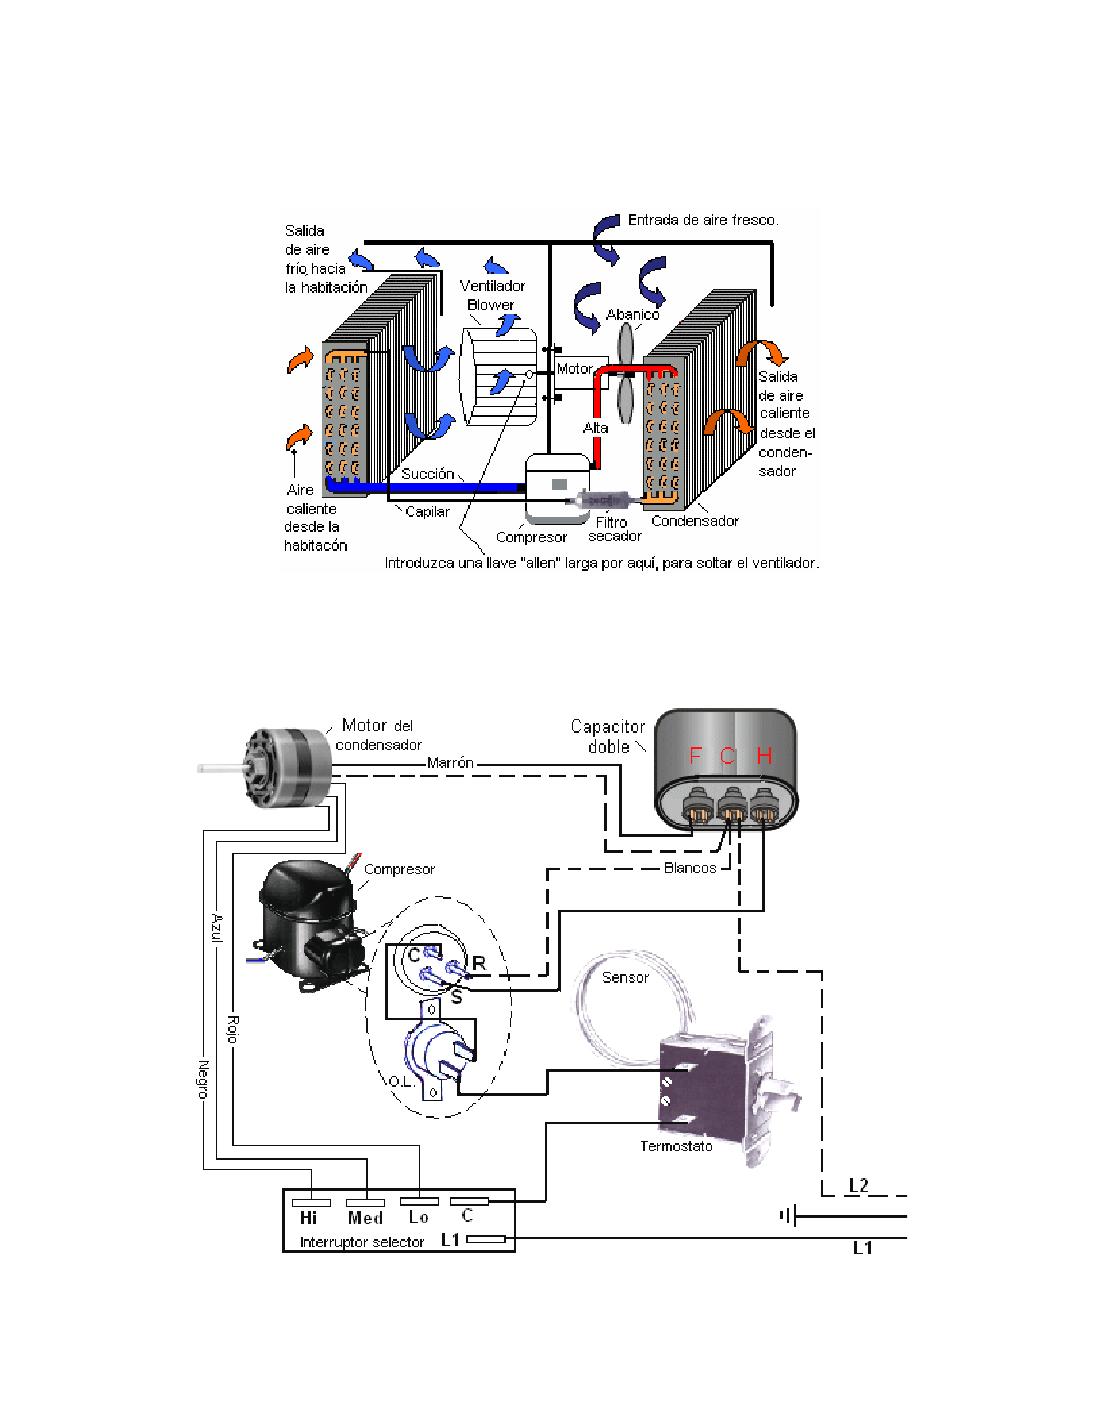 Copeland Compressor Run Capacitor Chart